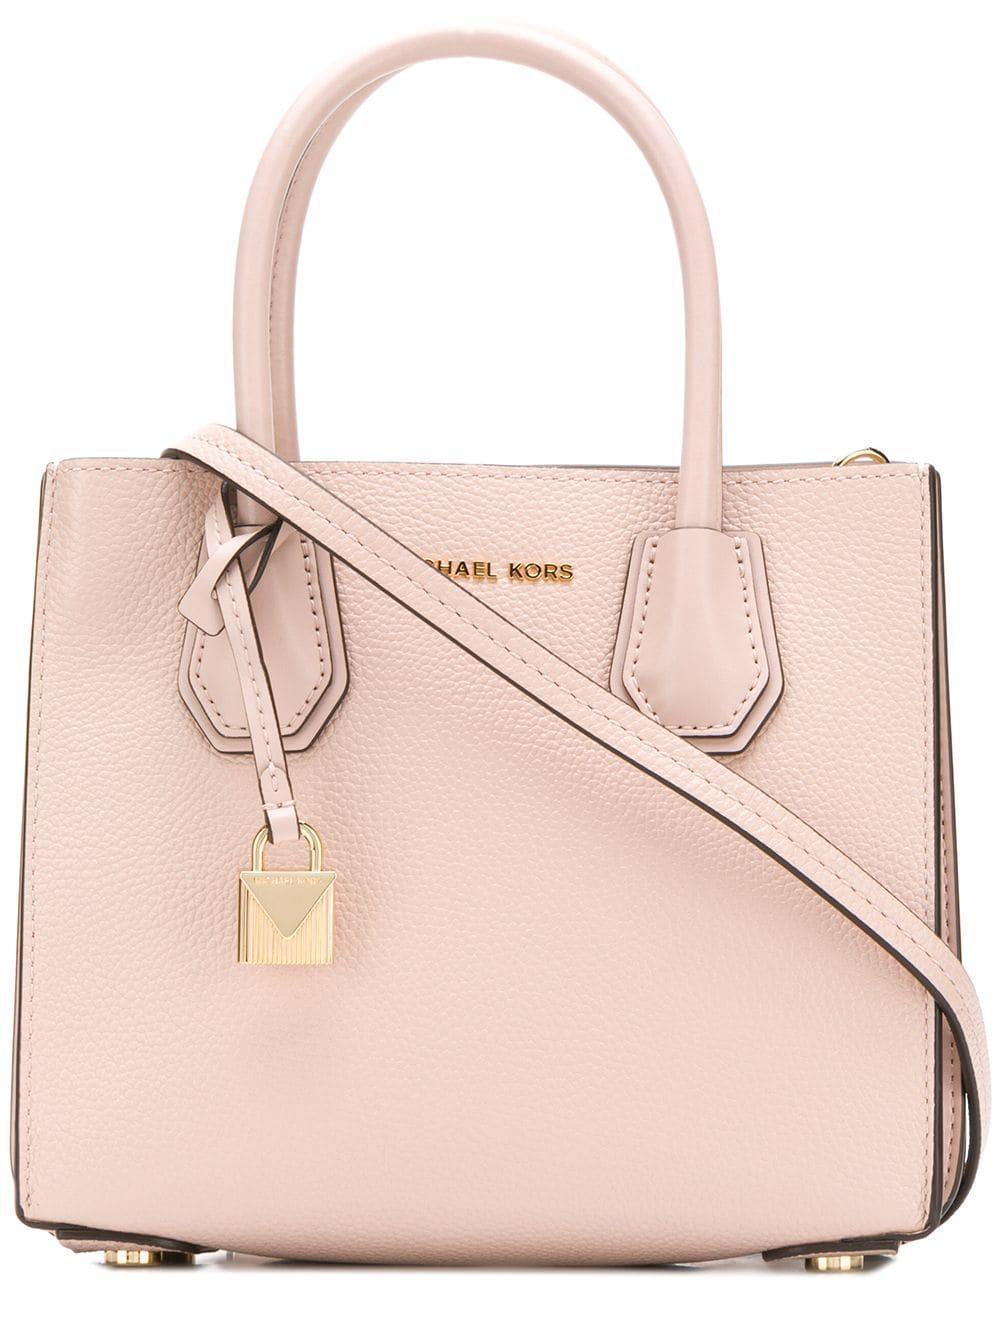 90b0951eeefe5 Michael Michael Kors Mercer Leather Tote Bag in Pink - Lyst